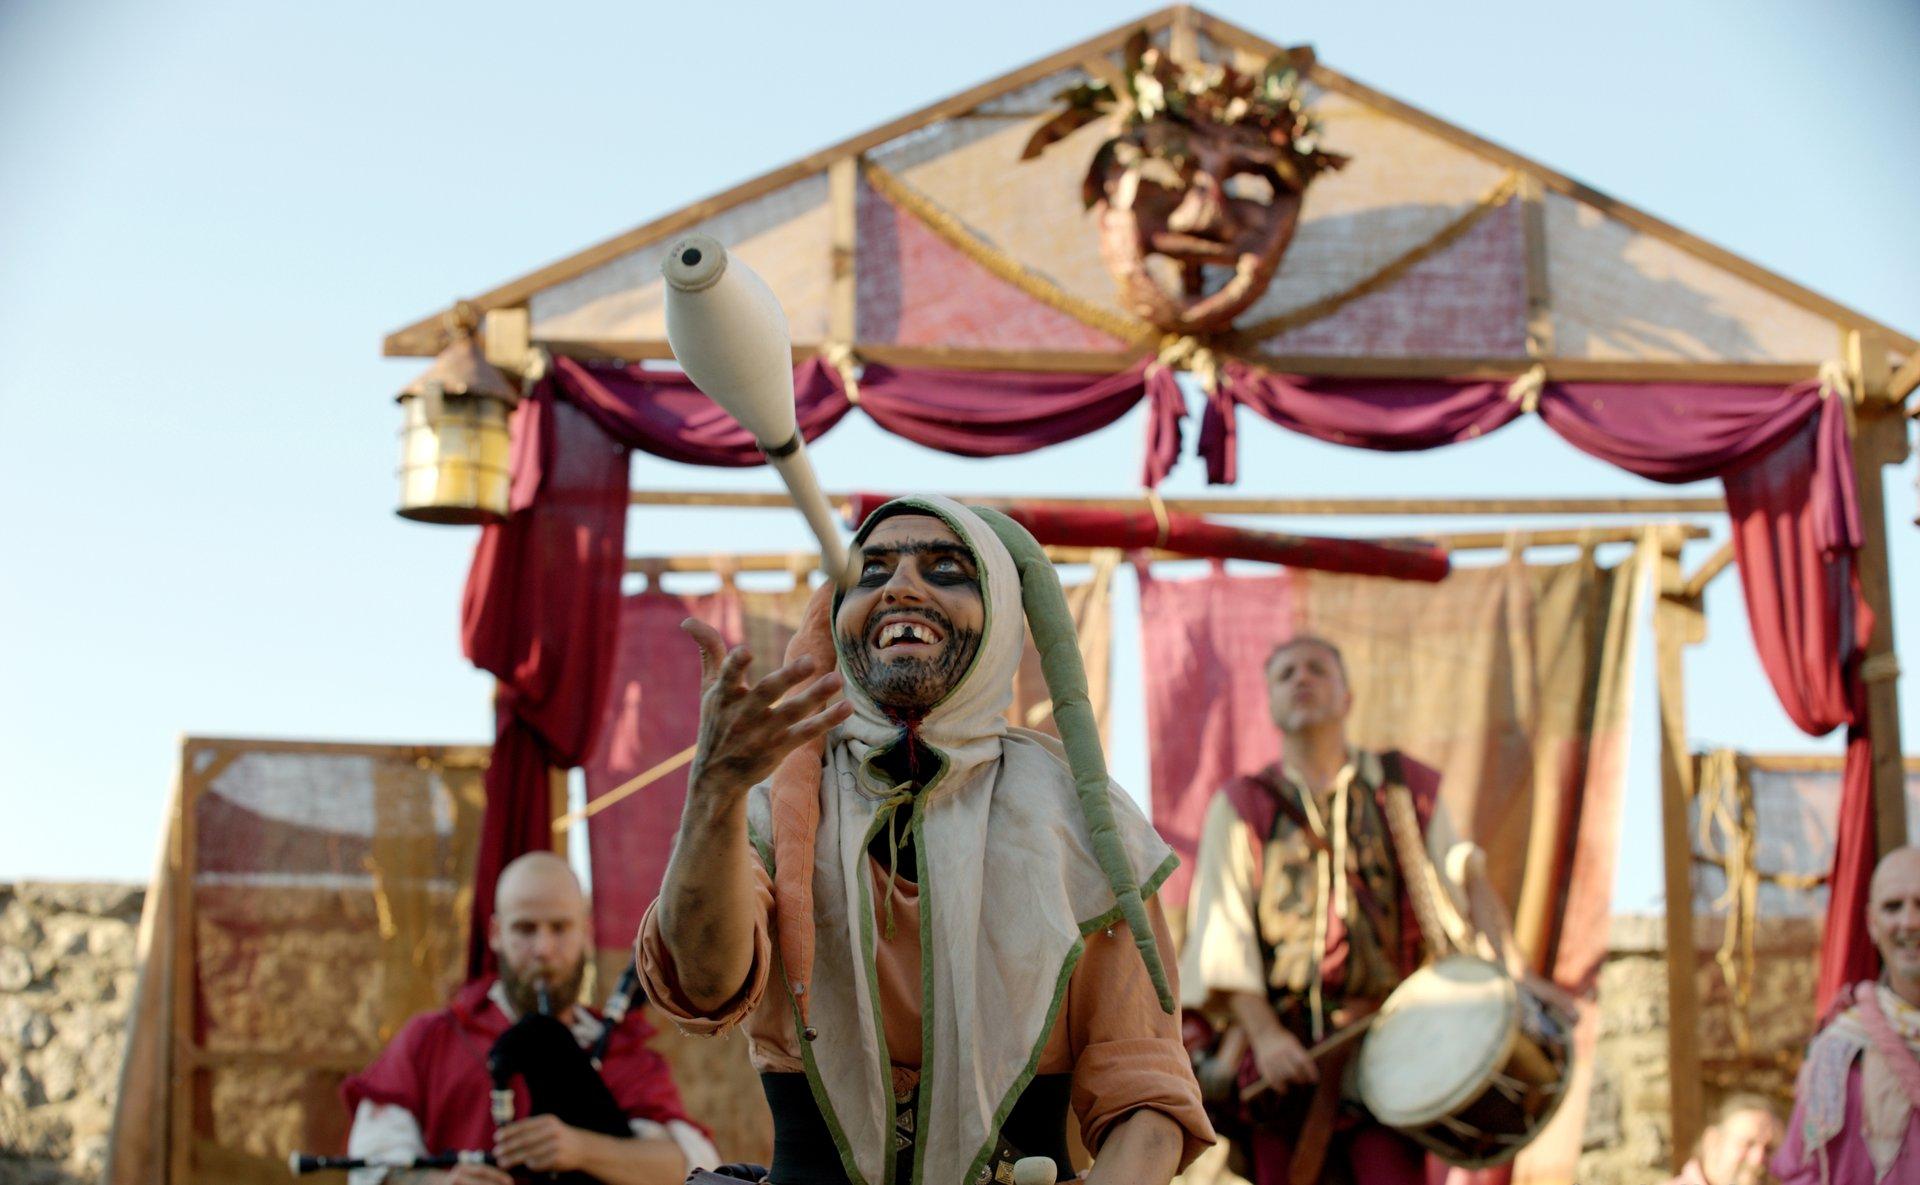 Medieval Festival Monteriggioni in Tuscany - Best Season 2020